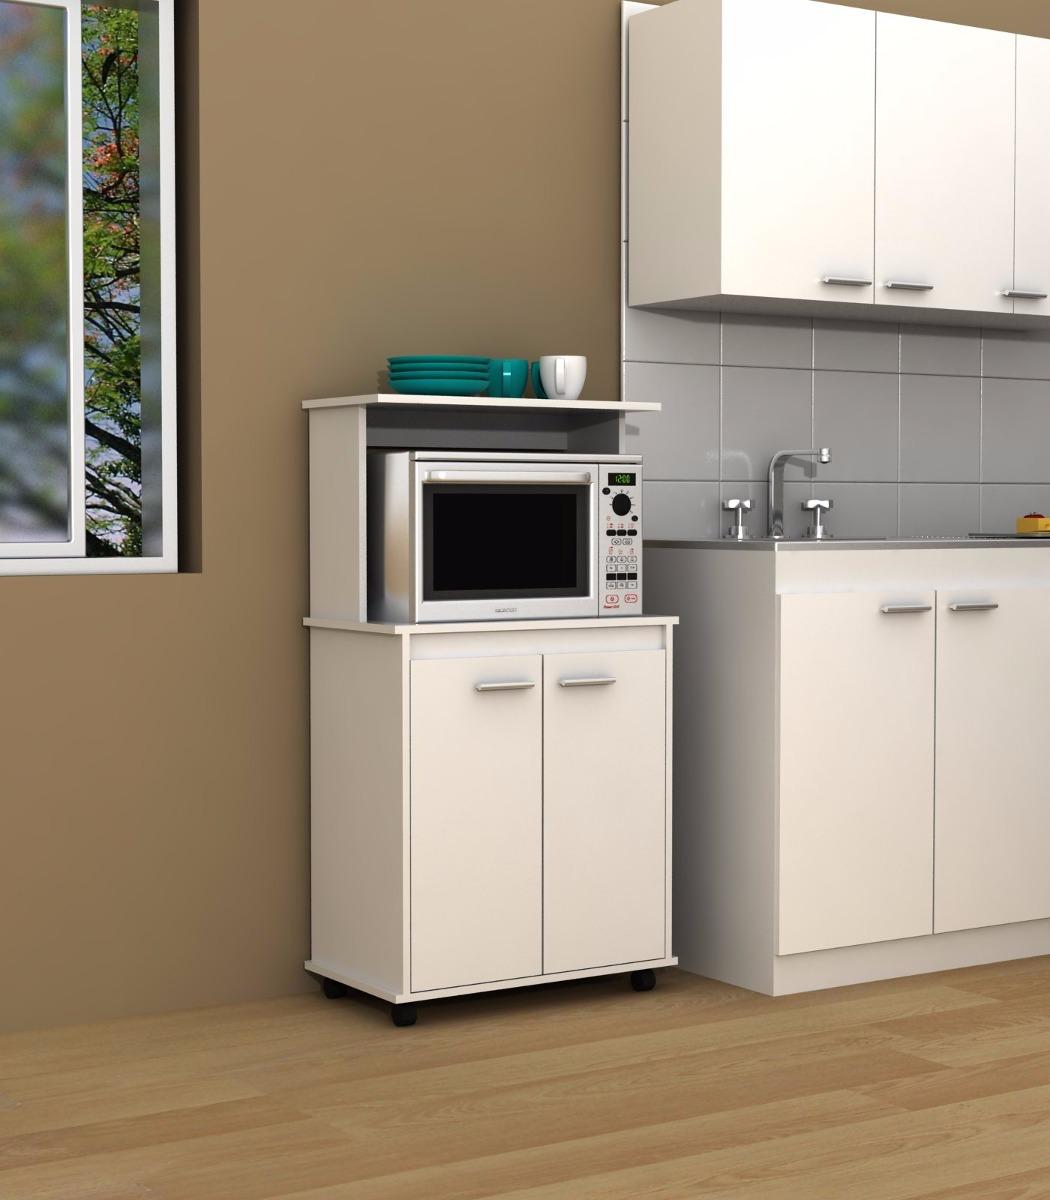 Mueble microondas roma linea italia rta 1 en for Mesa para microondas